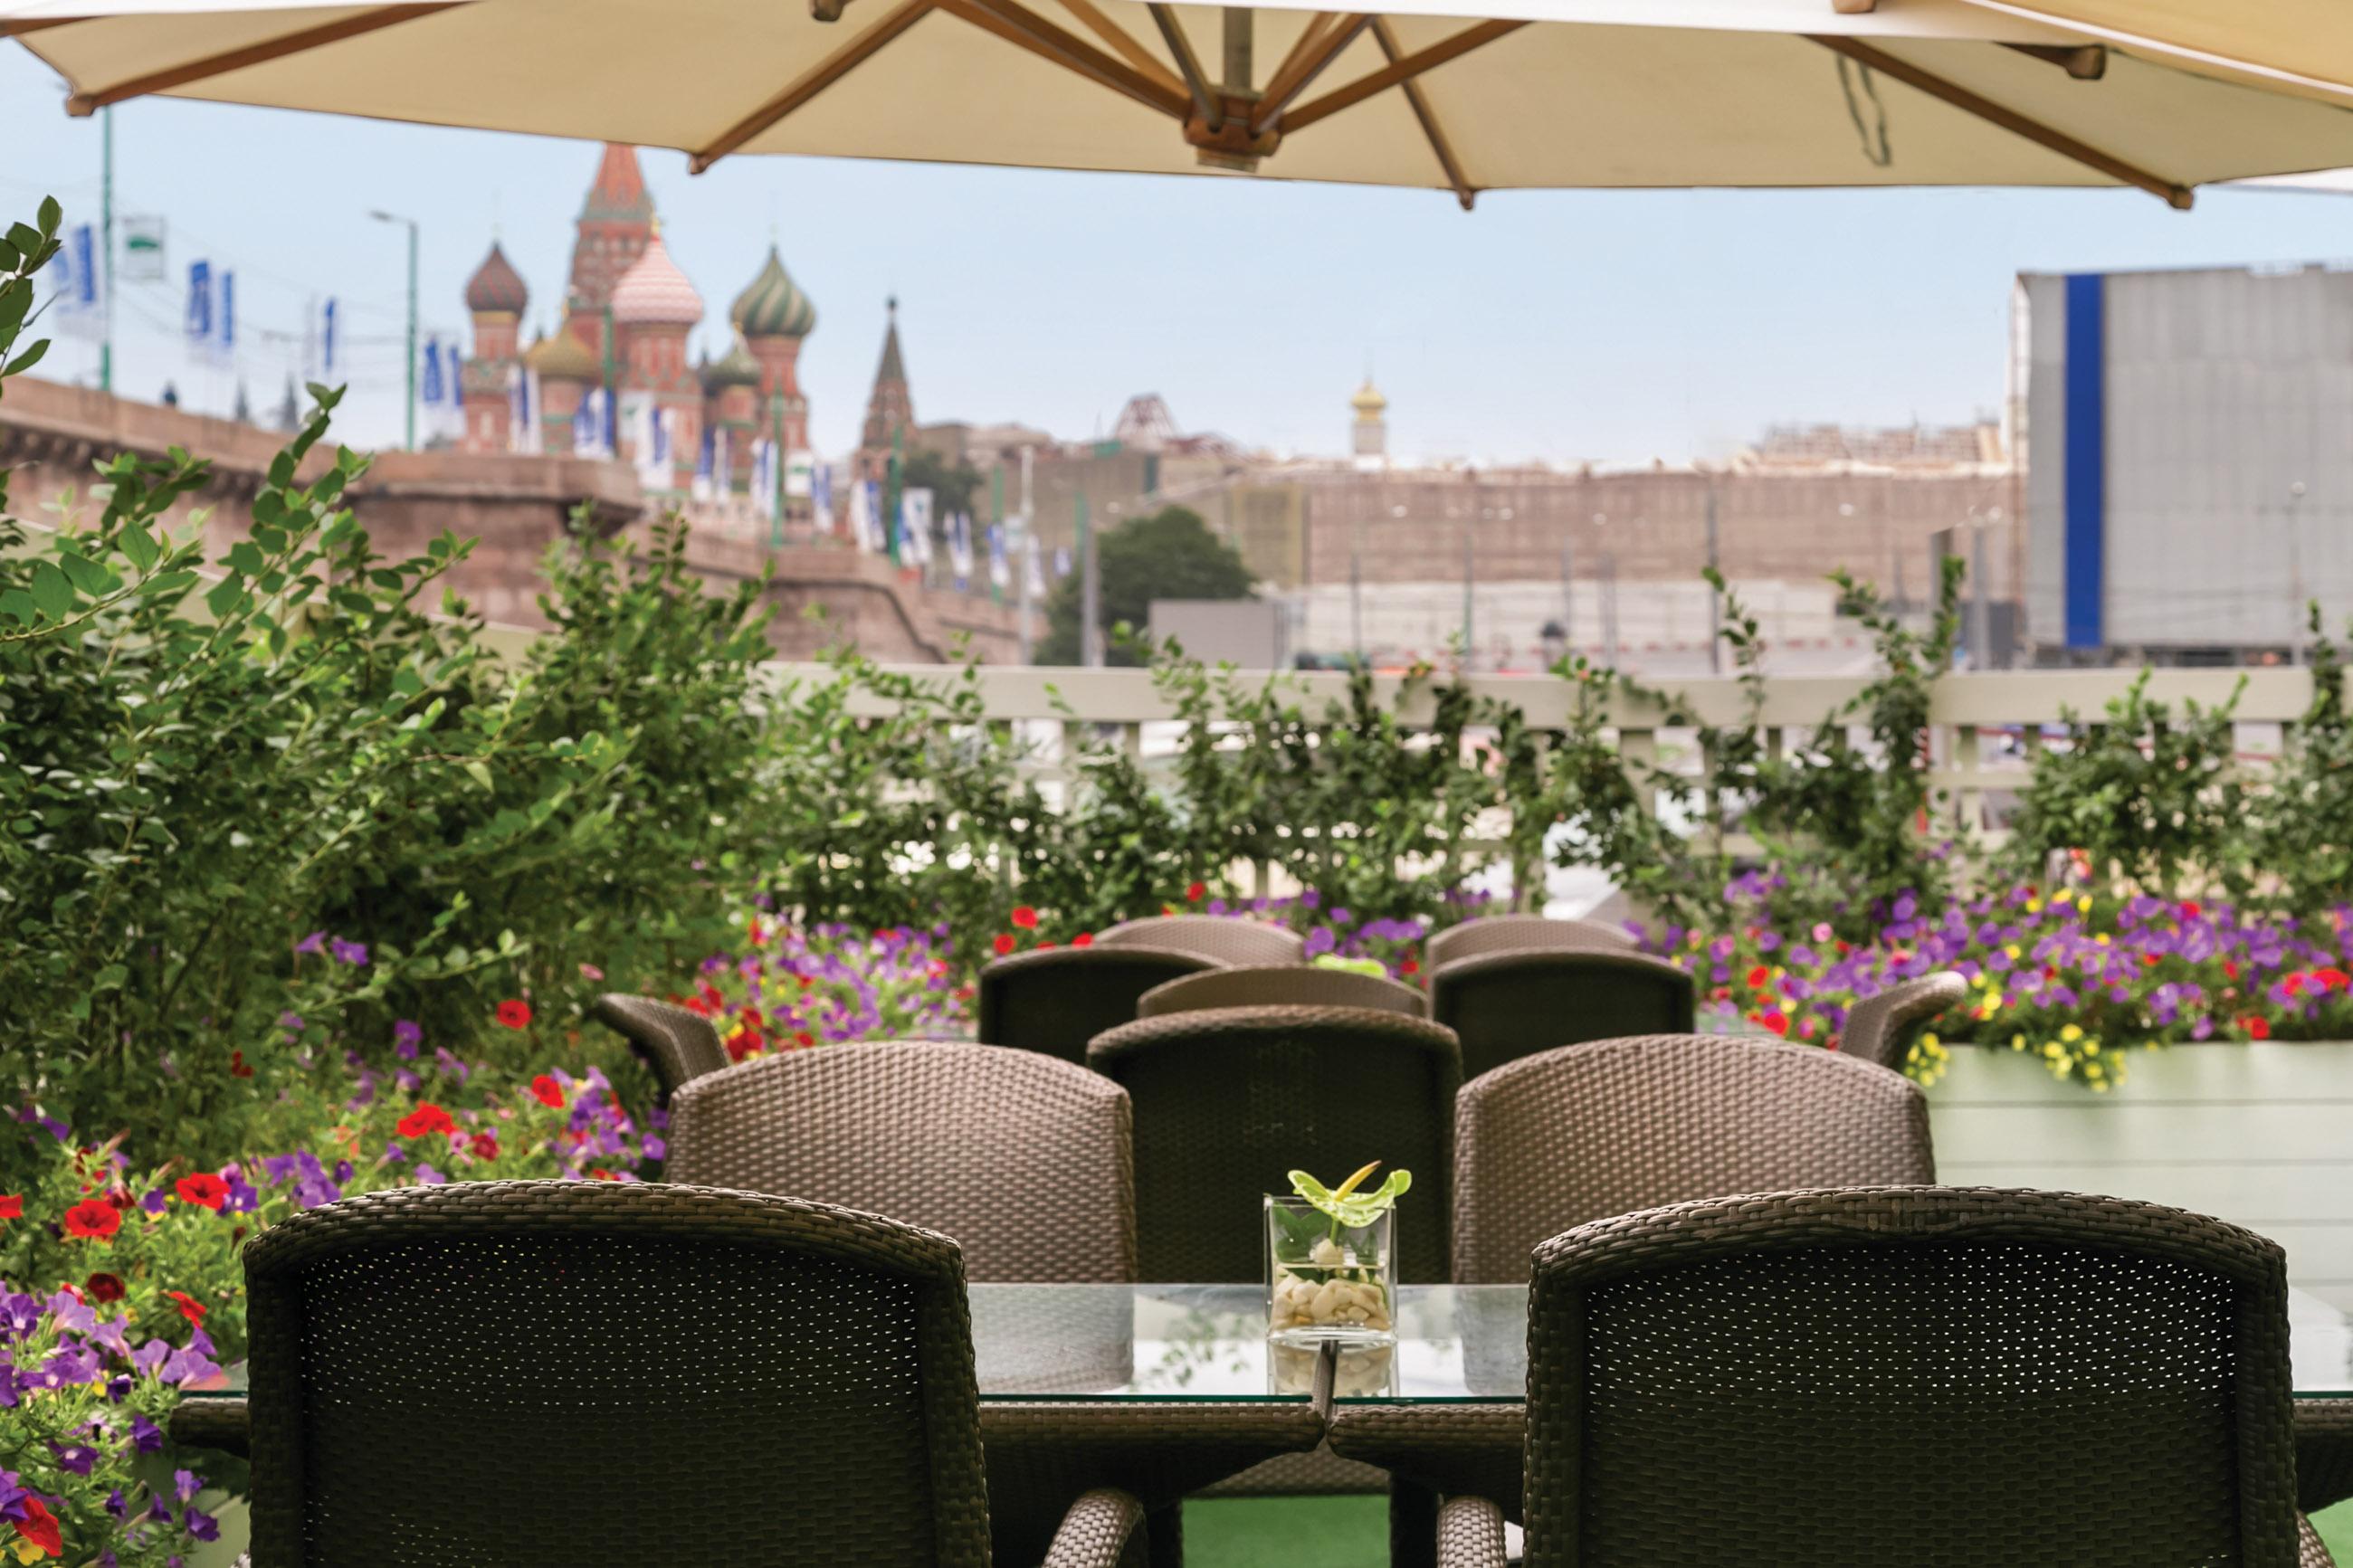 https://bubo.sk/uploads/galleries/5056/kempinski_moskva_rusko_highrez_summer_terrace.jpg